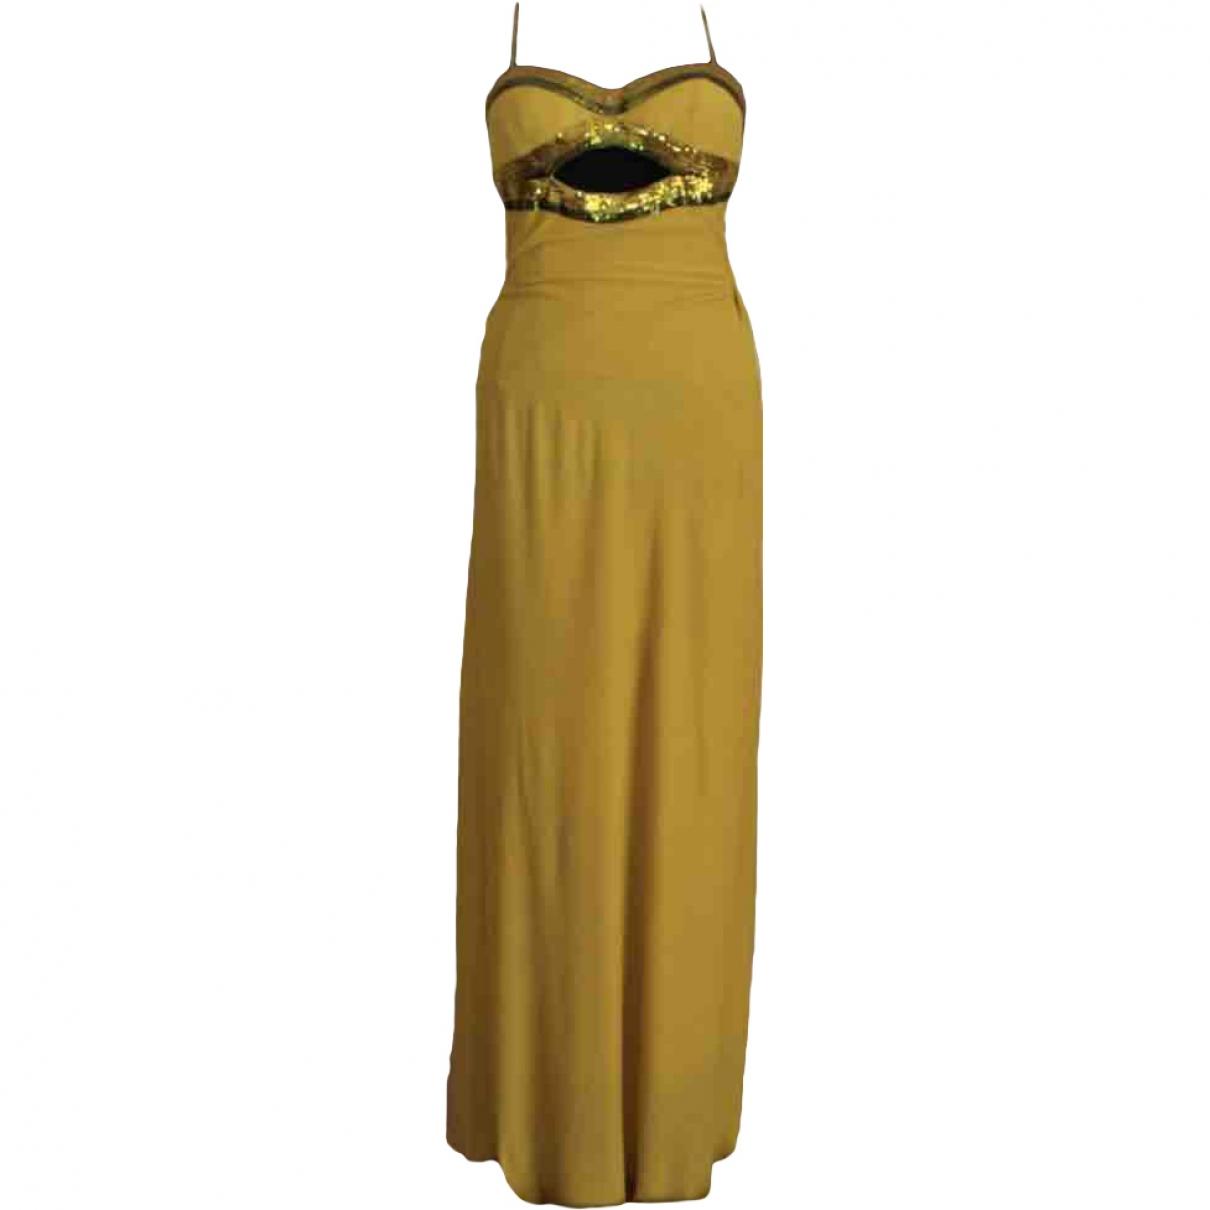 Gianni Versace \N dress for Women 40 IT